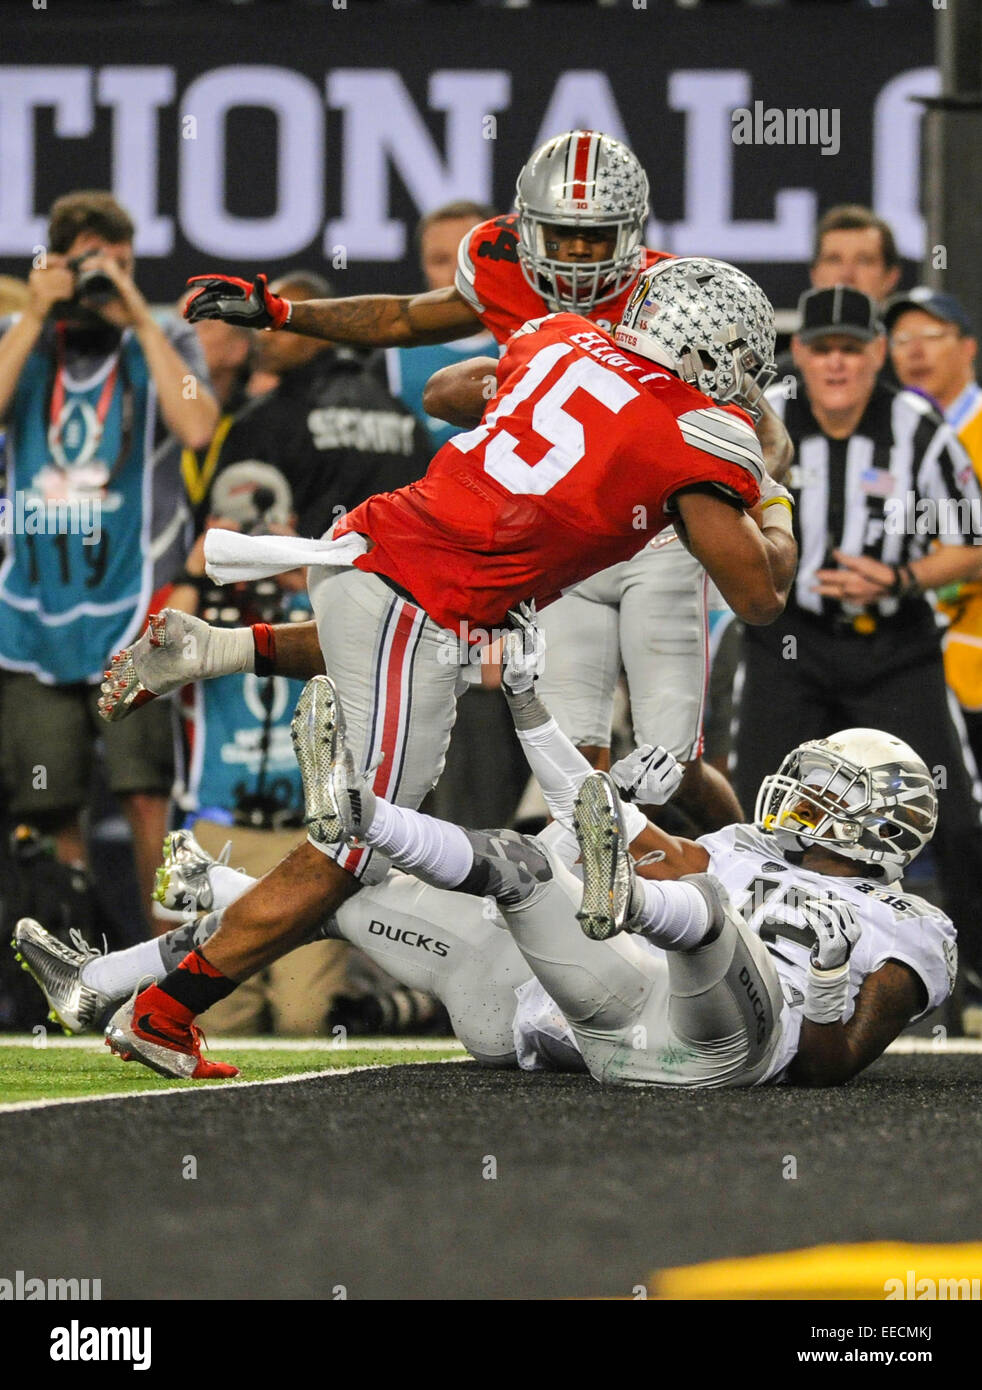 Ezekiel elliott ohio state beat oregon to win national - Ohio State Receiver Corey Smith 84 Watches As Running Back Ezekiel Elliott 15 Runs Over Oregon Defensive Backs Chris Seisay 12 And Tyree Robinson 2